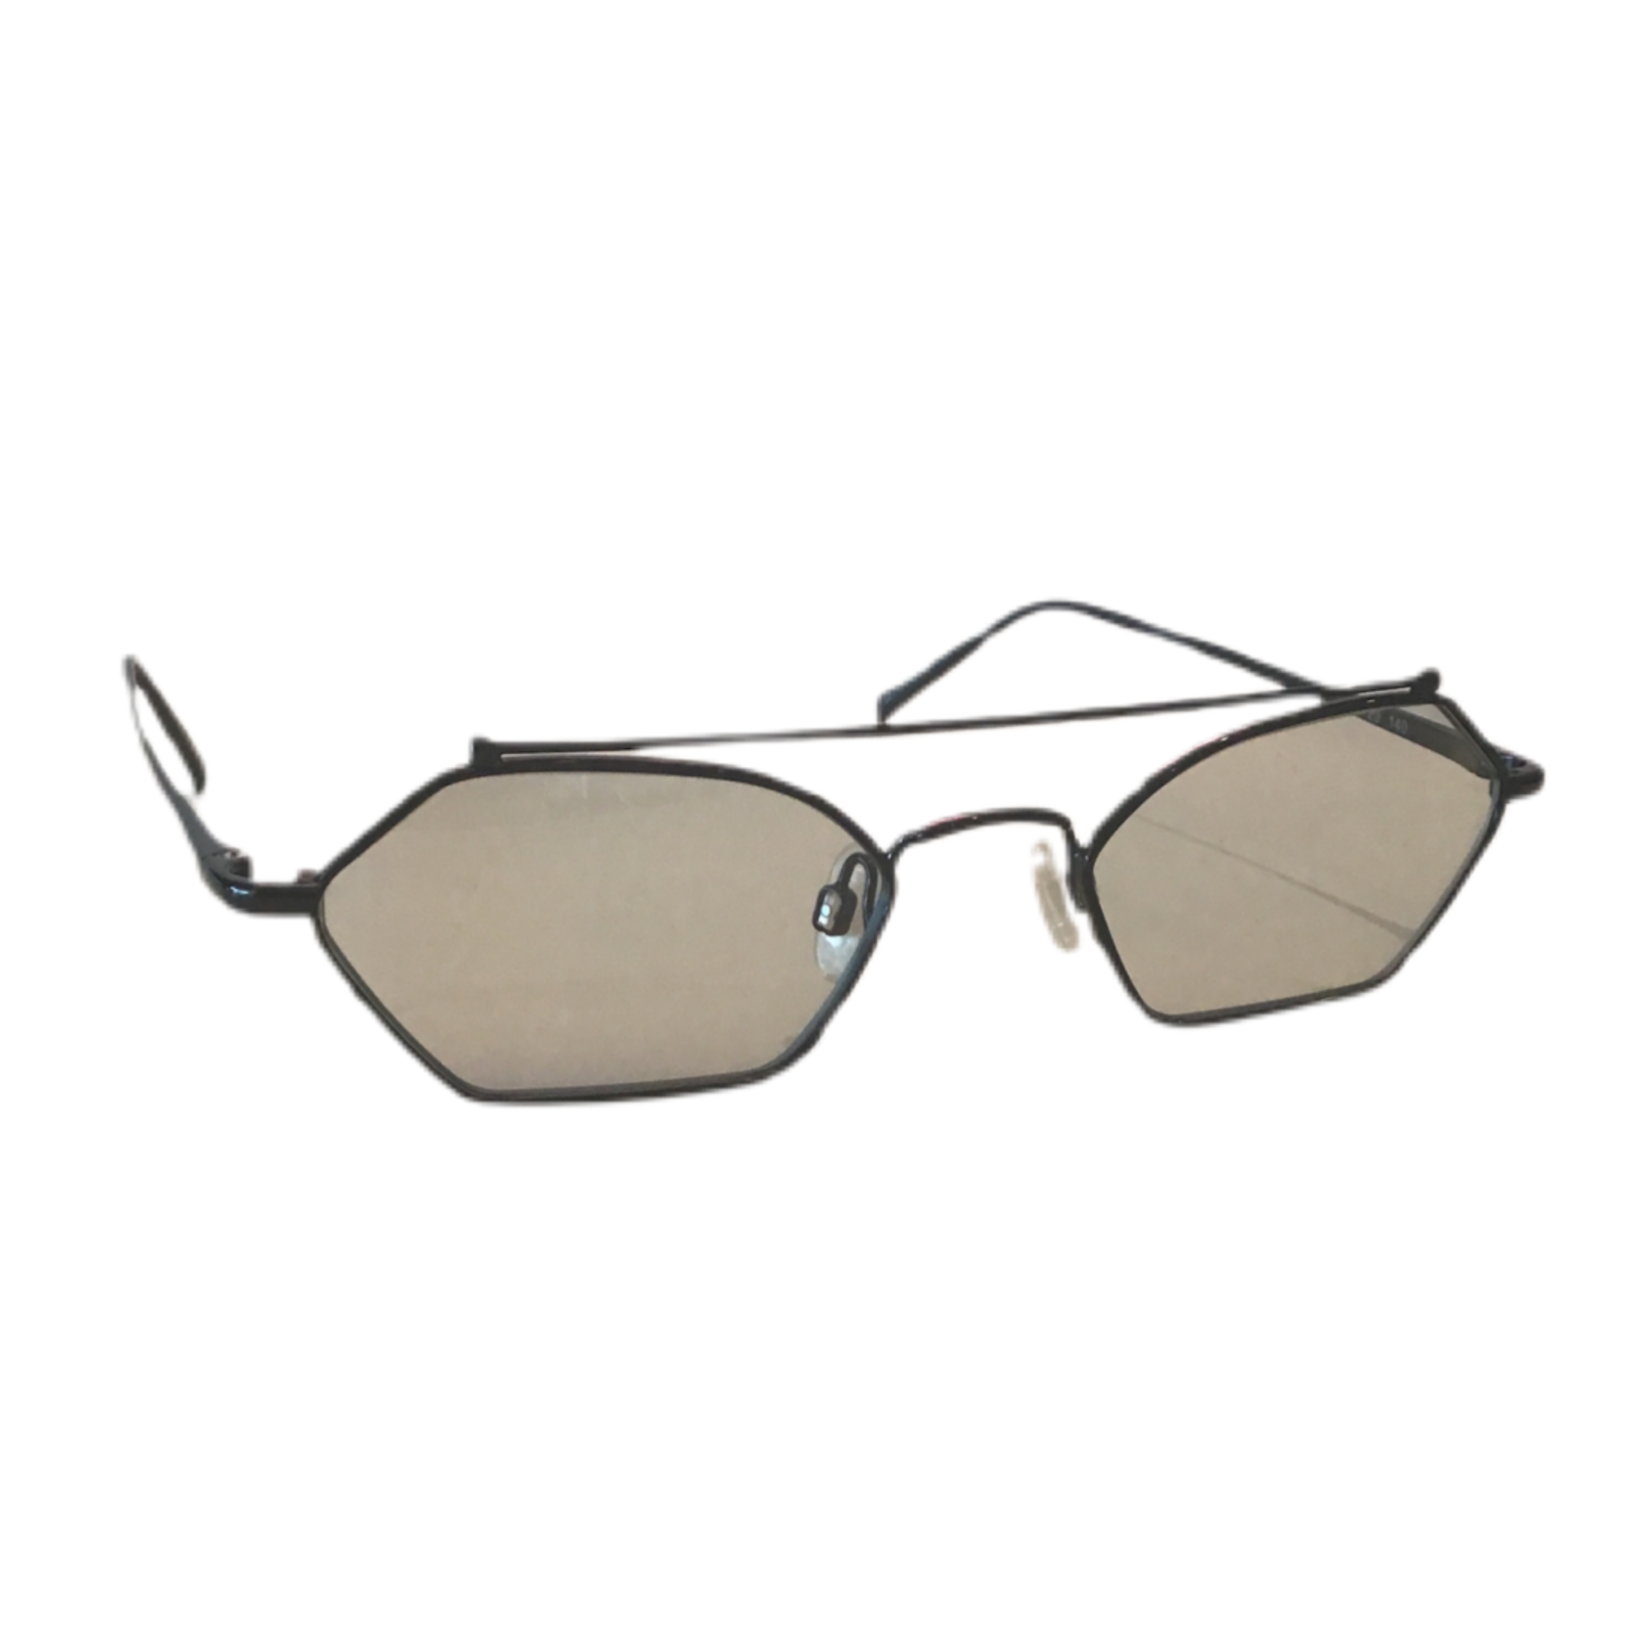 Wyld Blue Clear black frame sunglasses